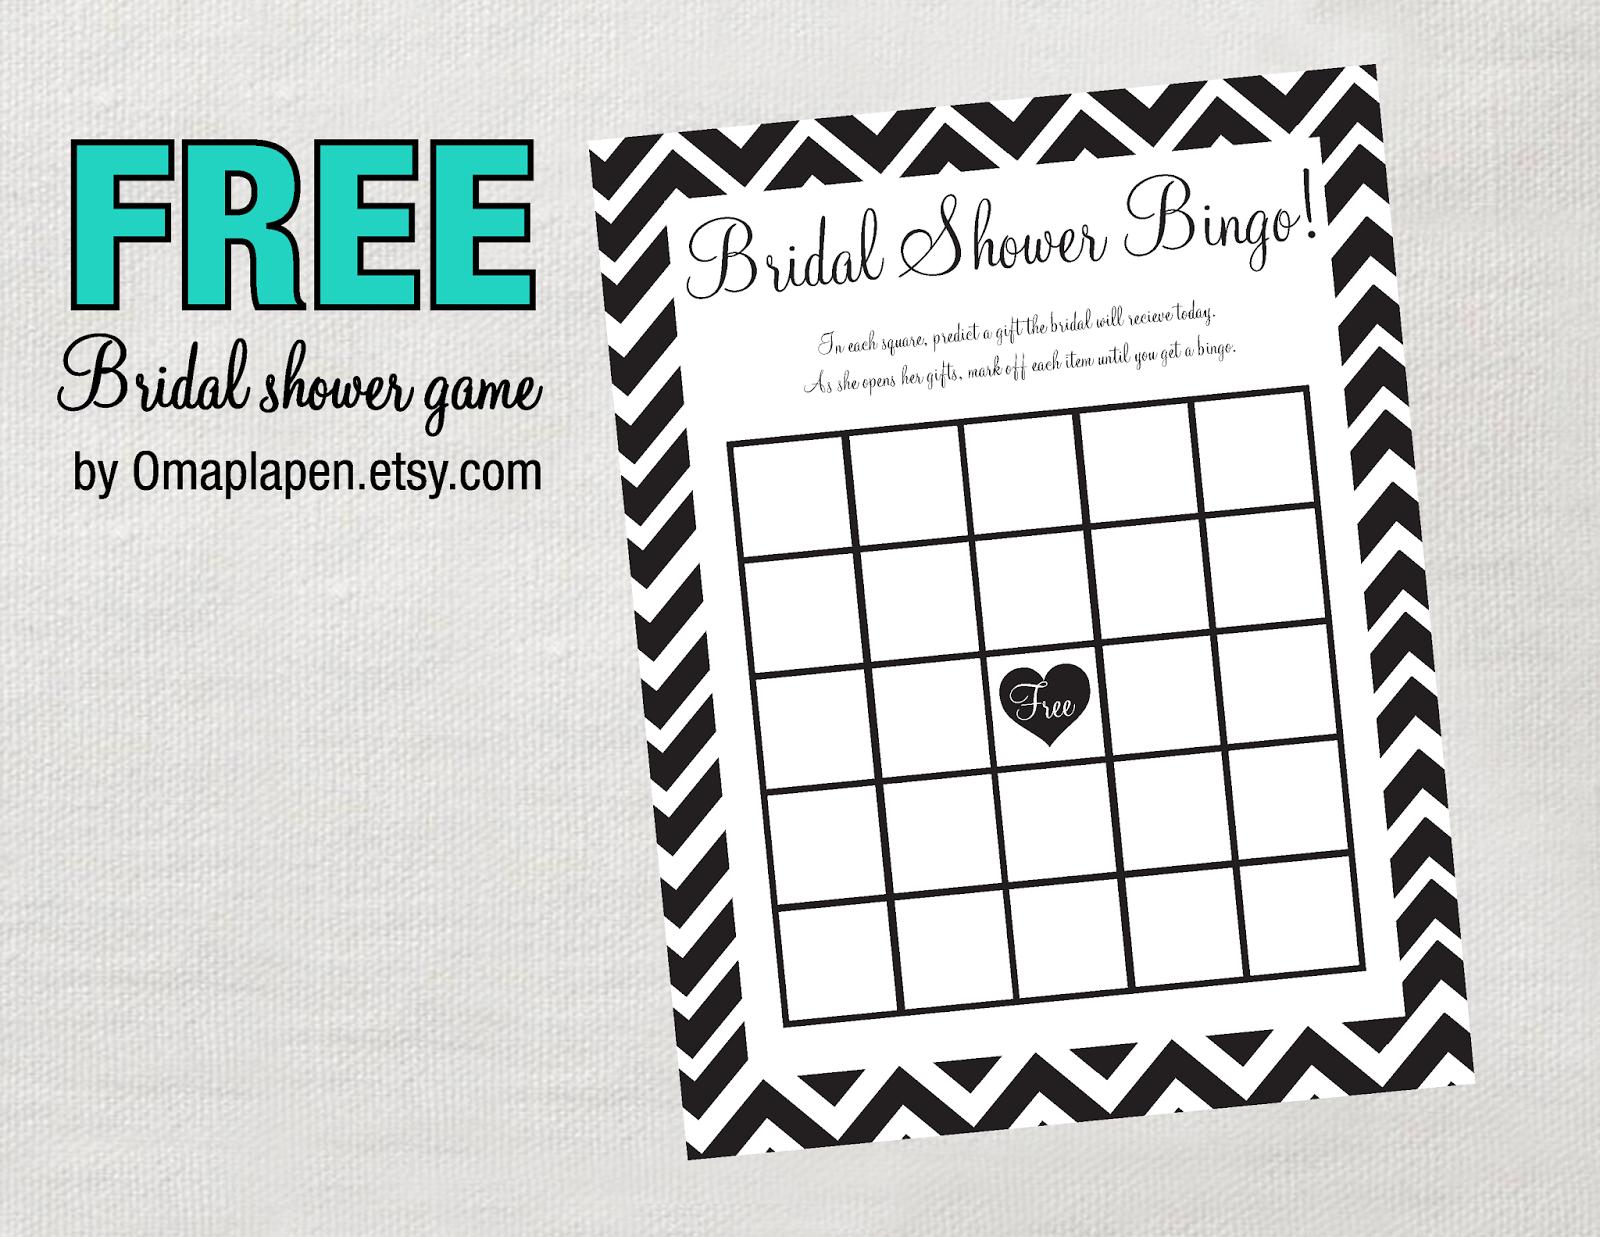 Photo : Free Wedding Shower Games Bingo Image - Free Printable Bridal Shower Blank Bingo Games